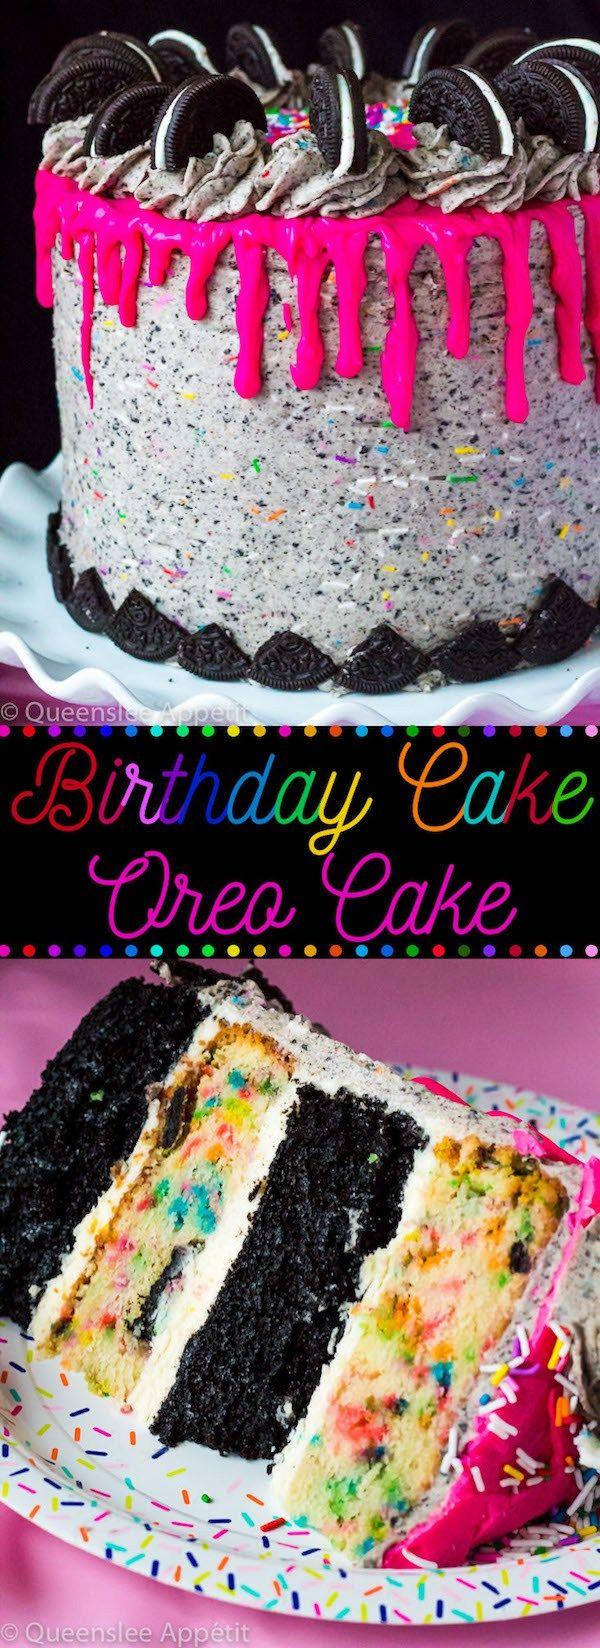 This Birthday Cake Oreo Cake just screams PARTY! Layers of dark chocolate and Fu…